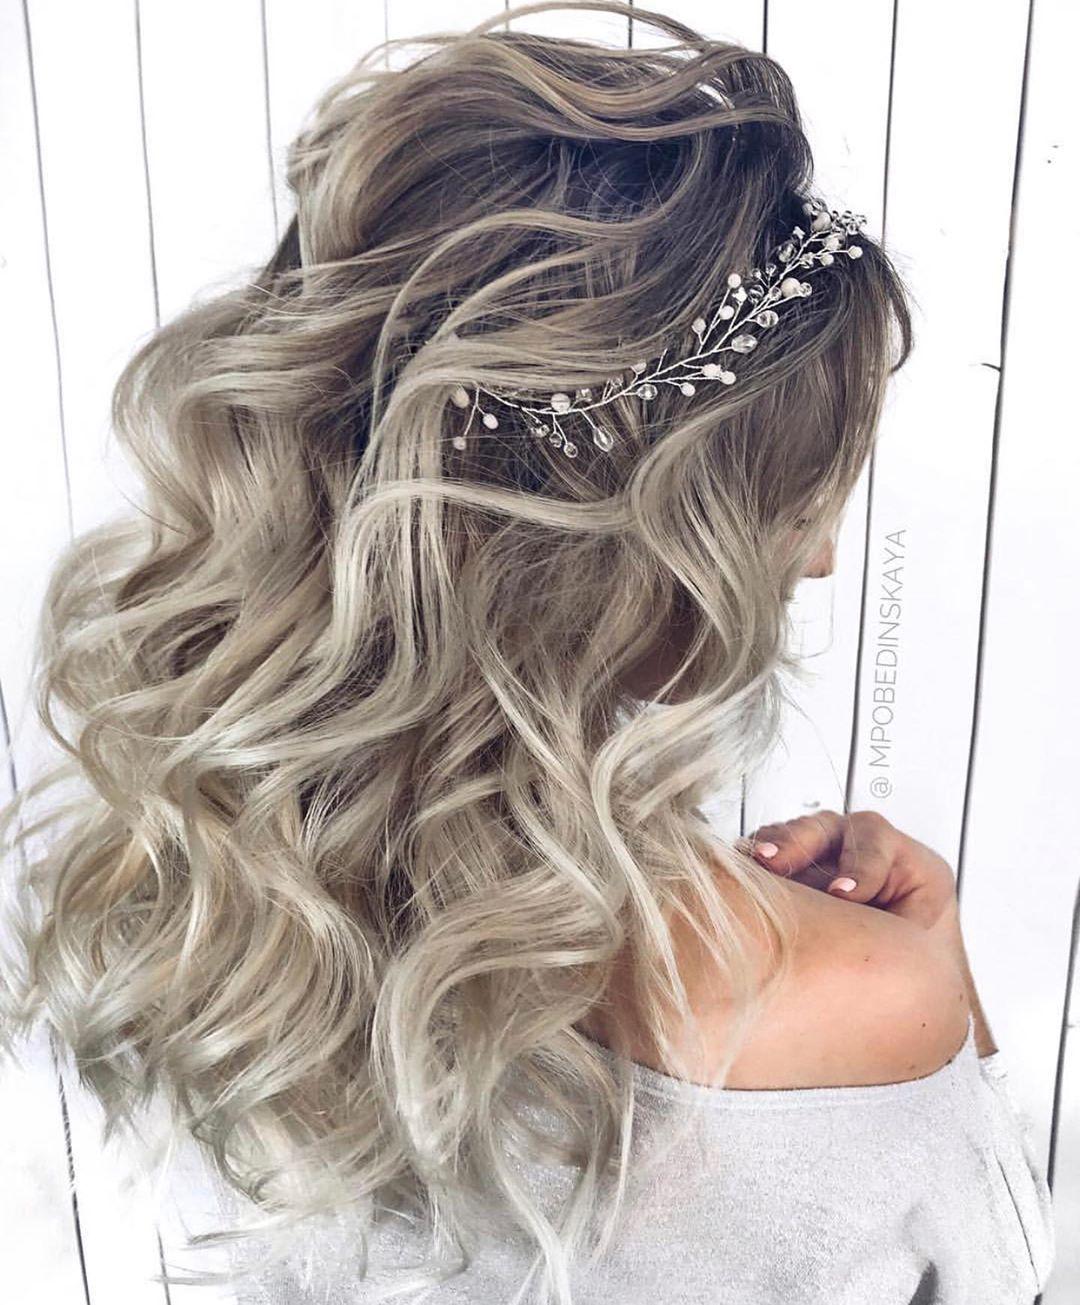 penteado de festa cabelo solto